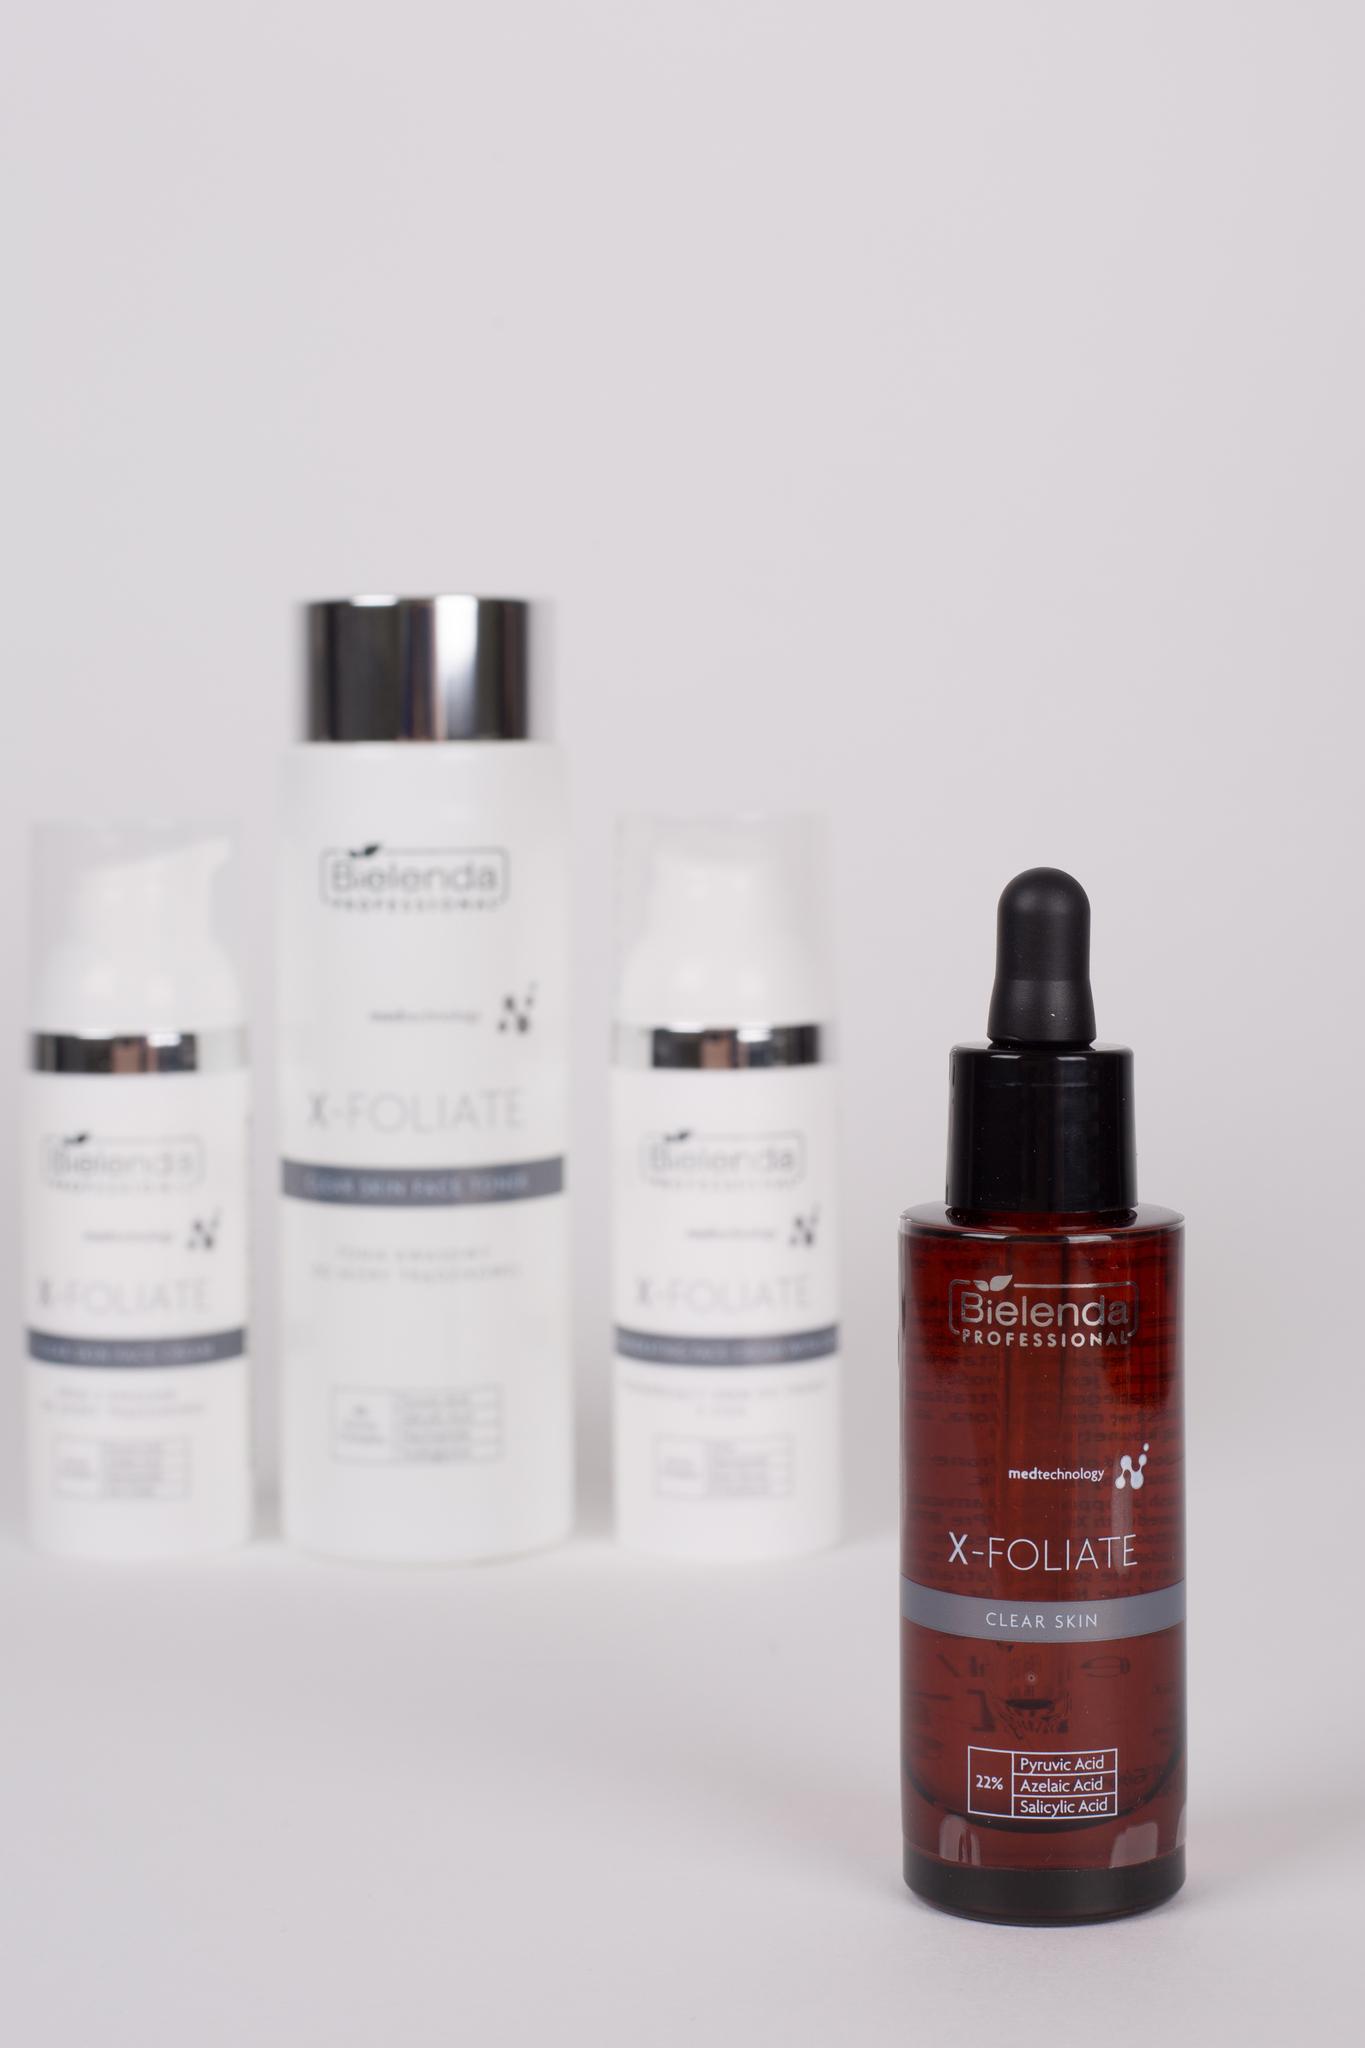 X-FOLIATE Clear Skin Крем для лица с кислотами для жирной кожи, склонной к акне, 50мл.